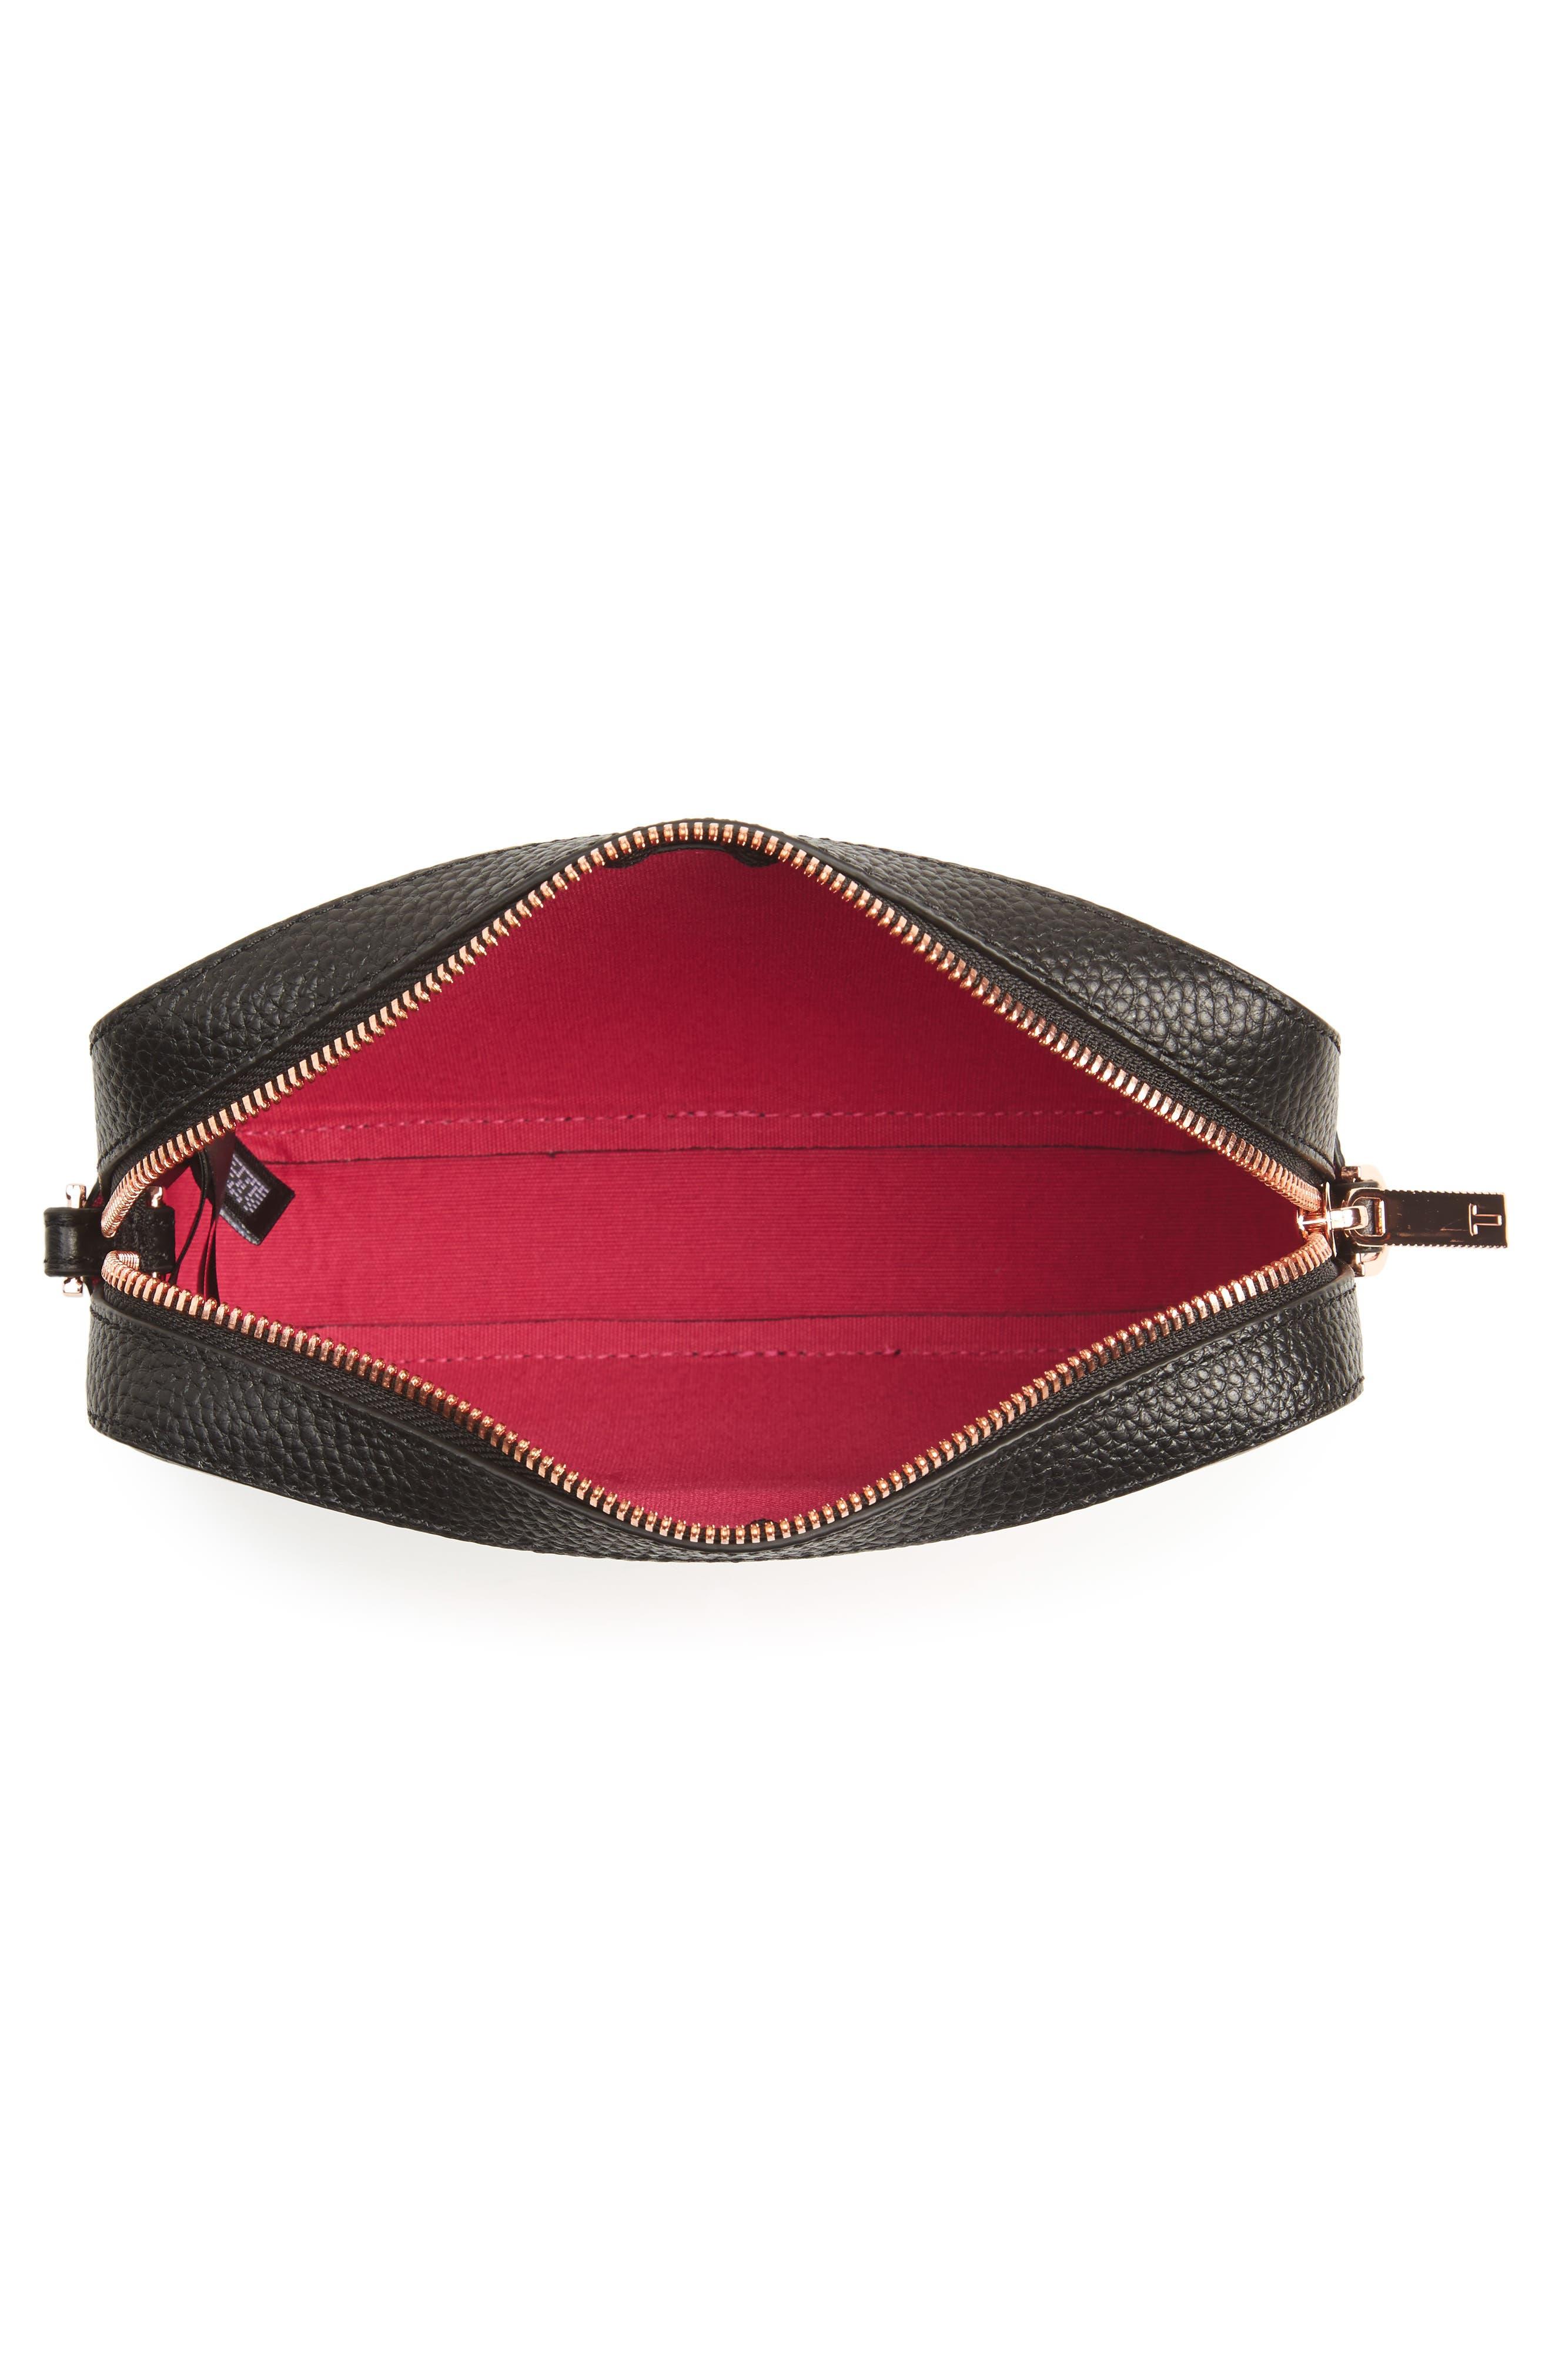 Susi Leather Crossbody Bag,                             Alternate thumbnail 4, color,                             001